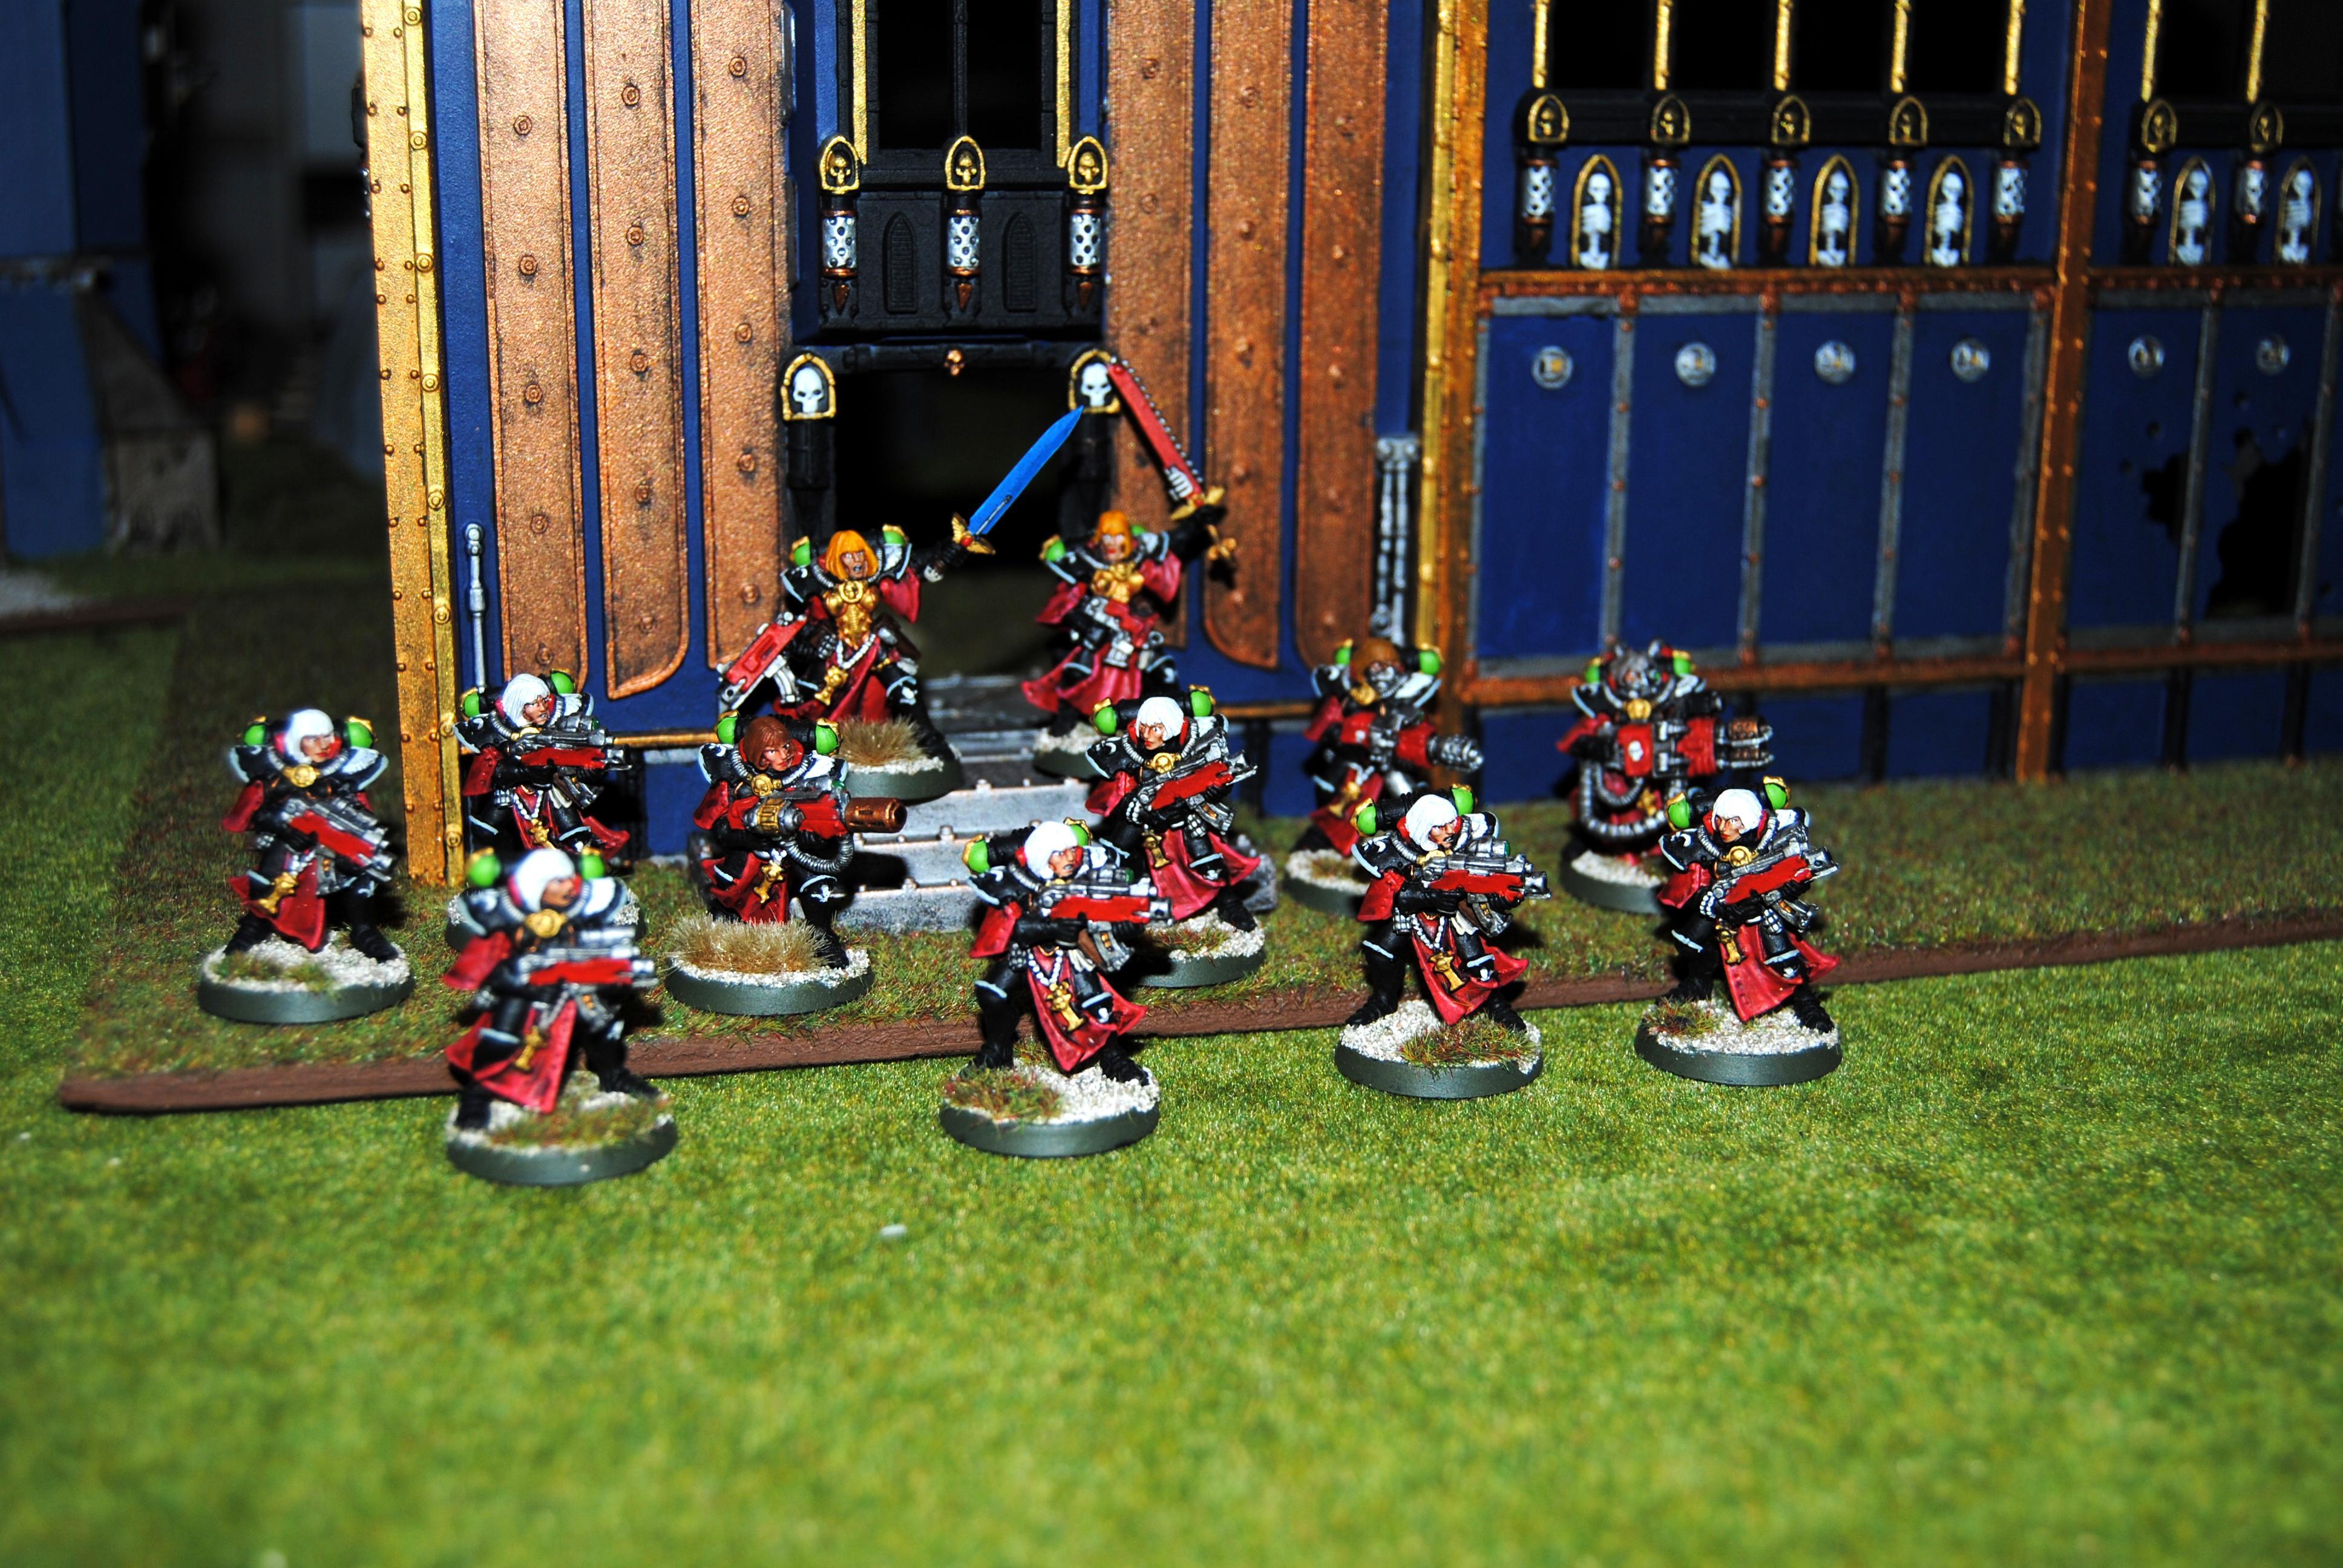 Adepta Sororitas, Battle Sister Squad, Flamer, Heavy Flamer, Meltagun, Sisters Of Battle, Veteran Sister Superior